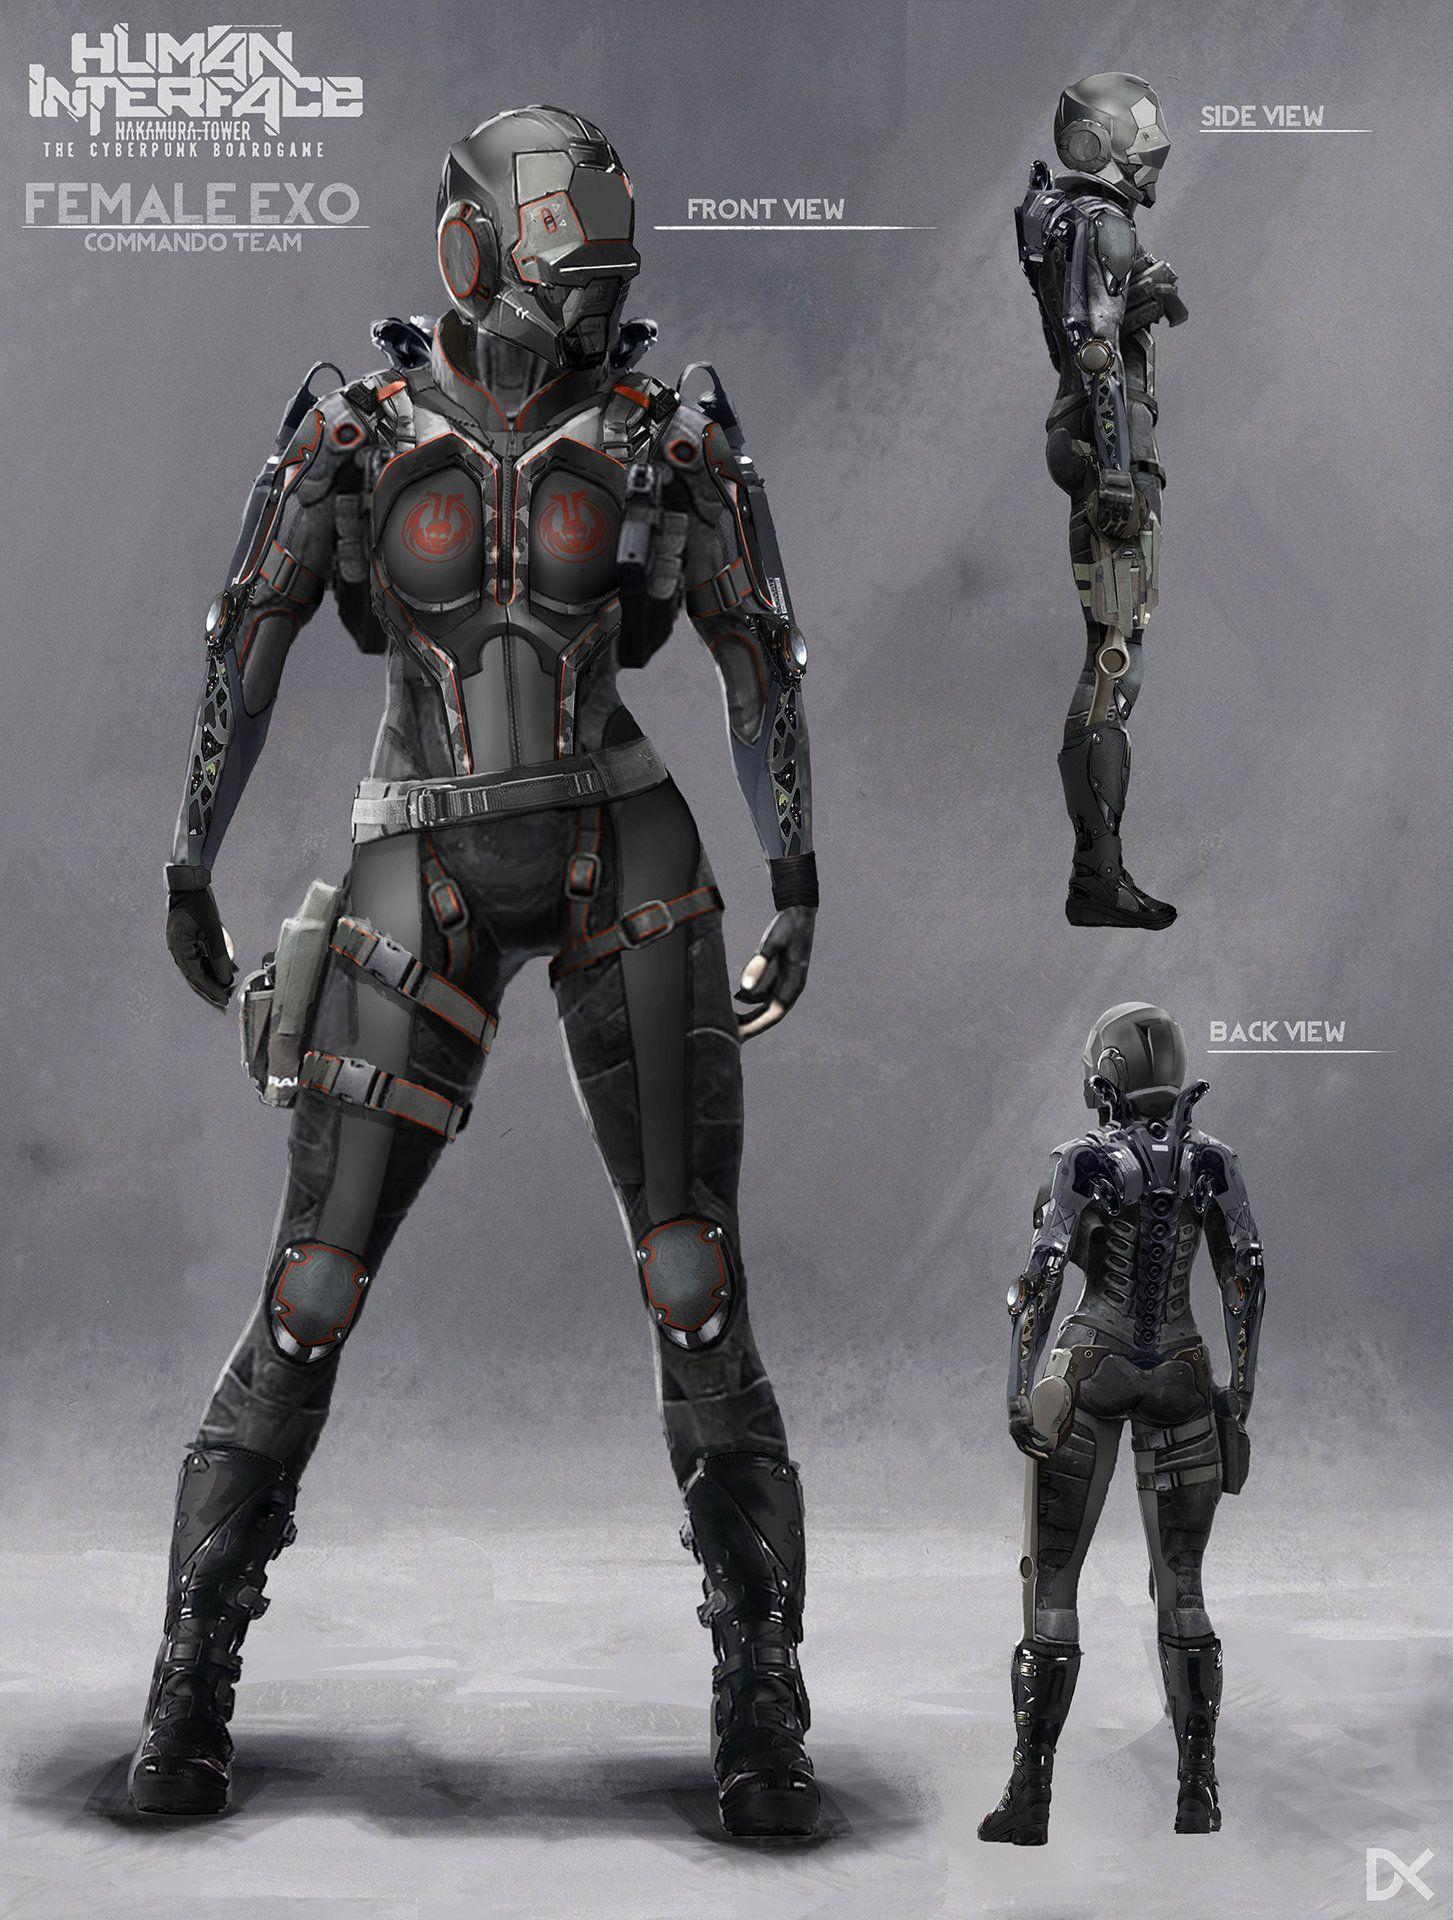 Pin by Tunc Tiryaki on Fantastik | Cyberpunk character, Game